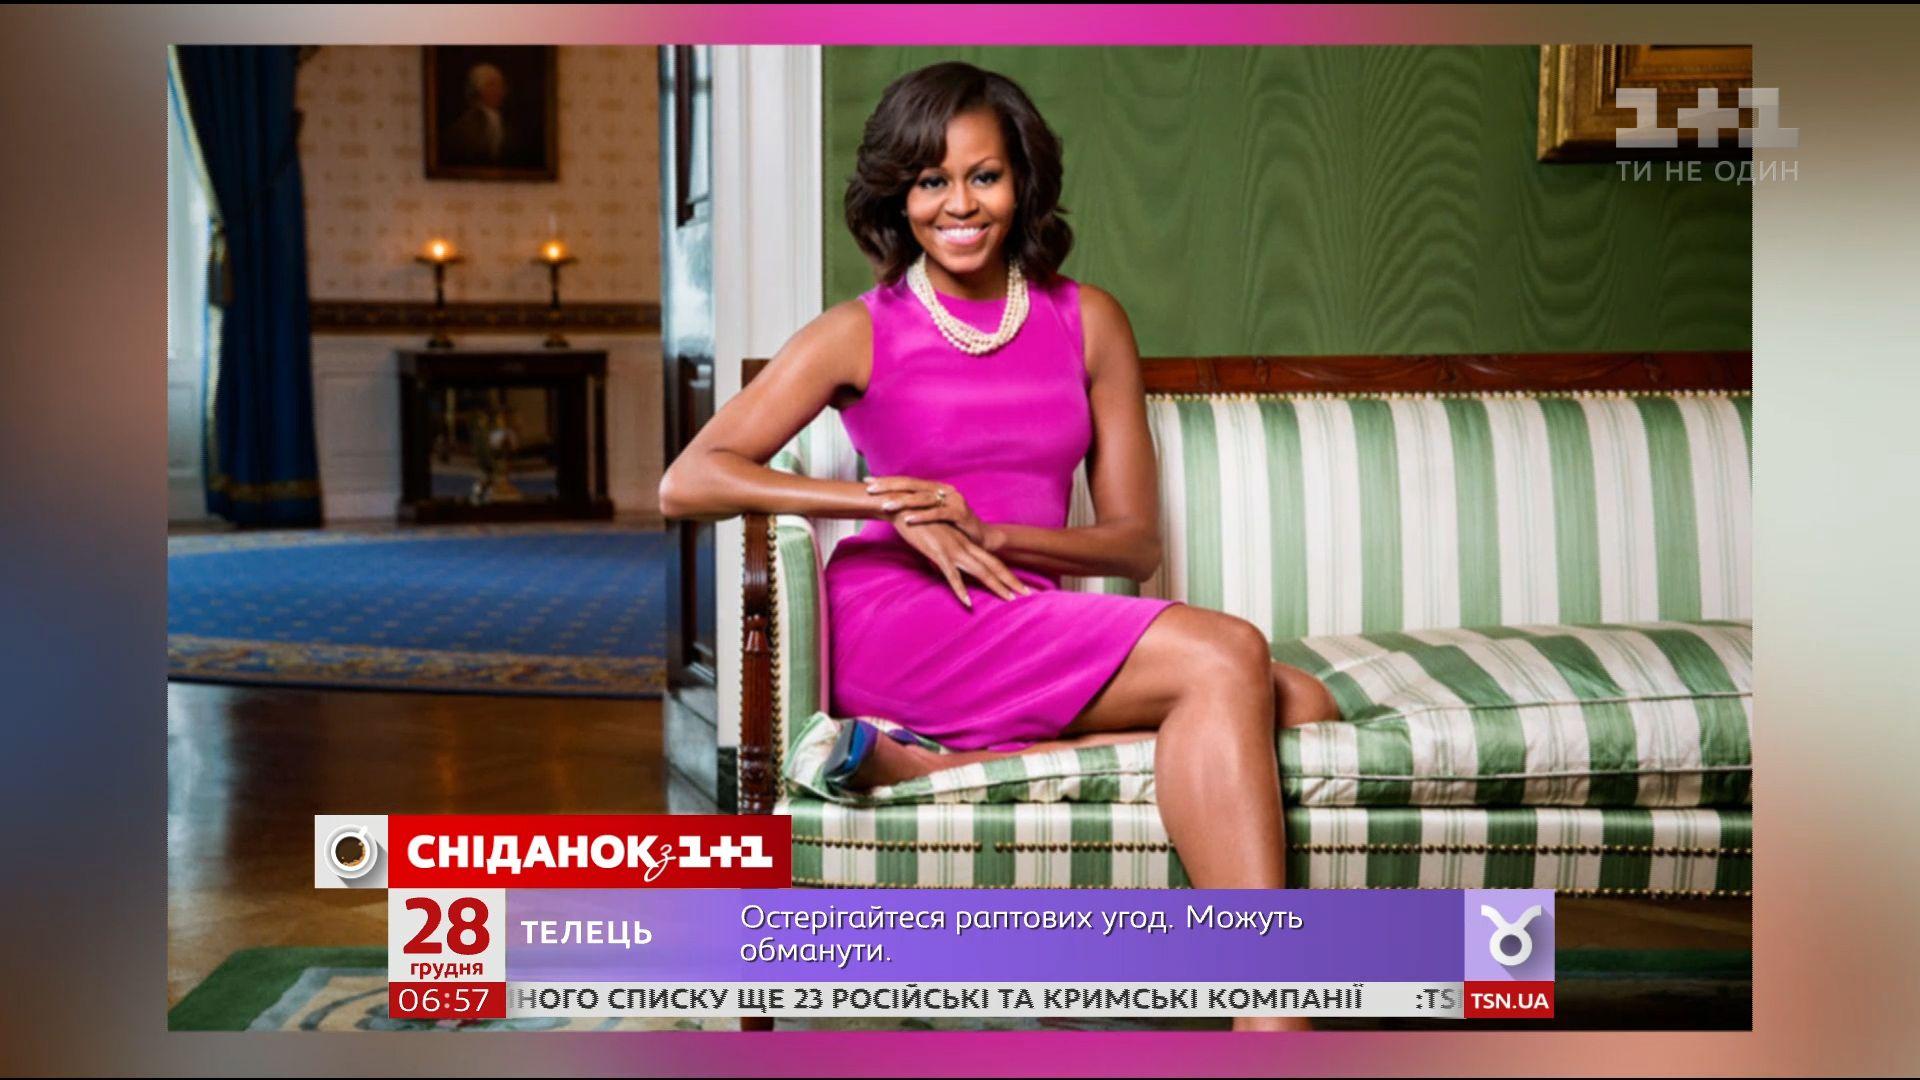 michelle obama thesis at princeton